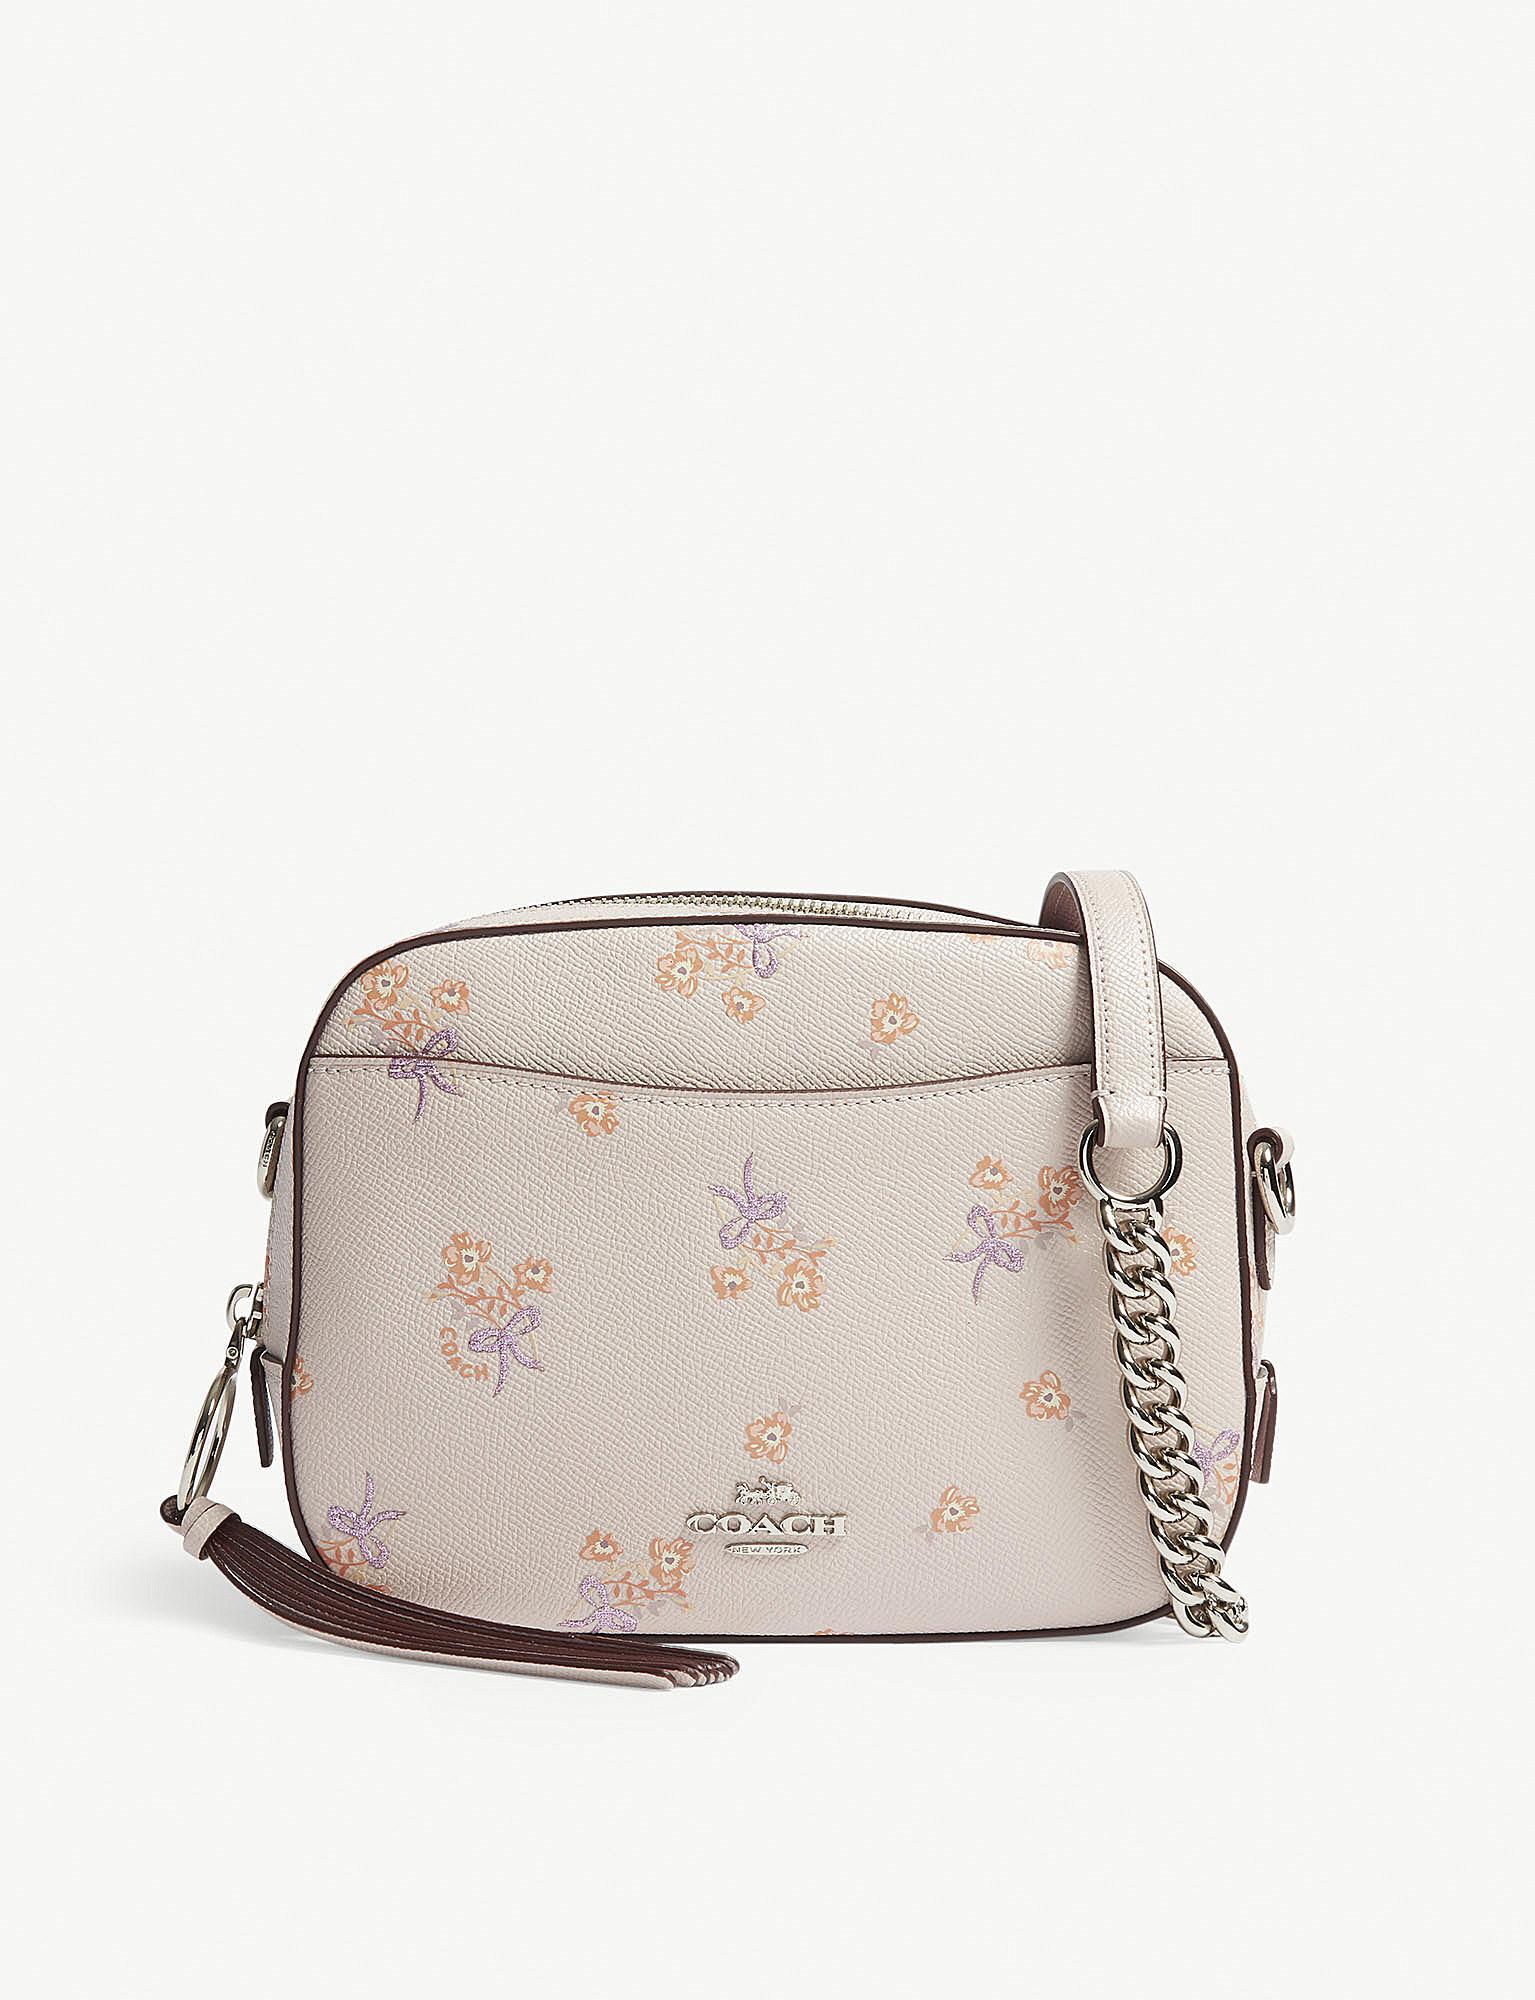 Coach Ladies Ice Pink Floral Elegant Leather Camera Cross Body Bag